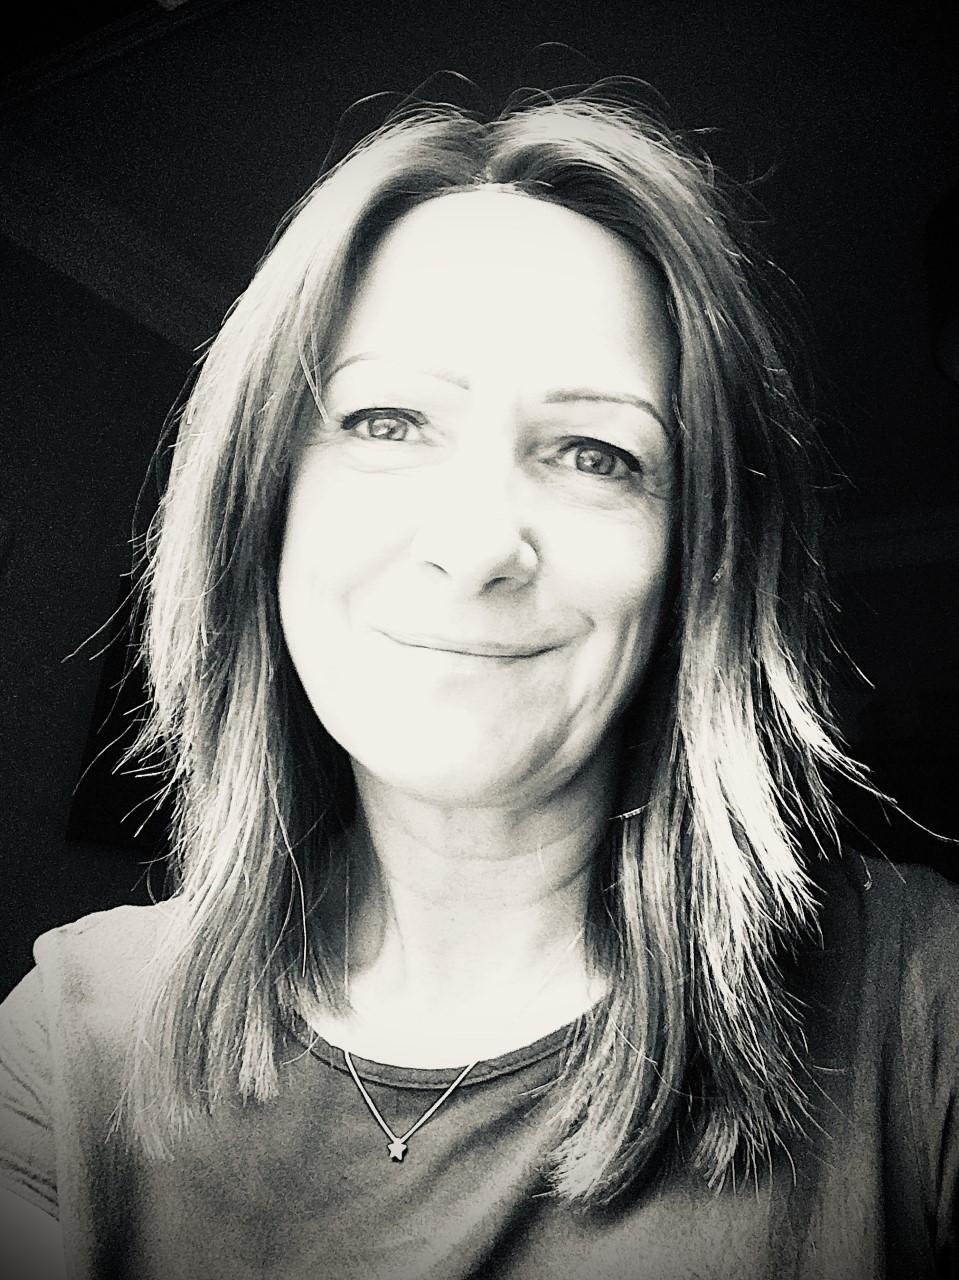 Veronica O'Hare